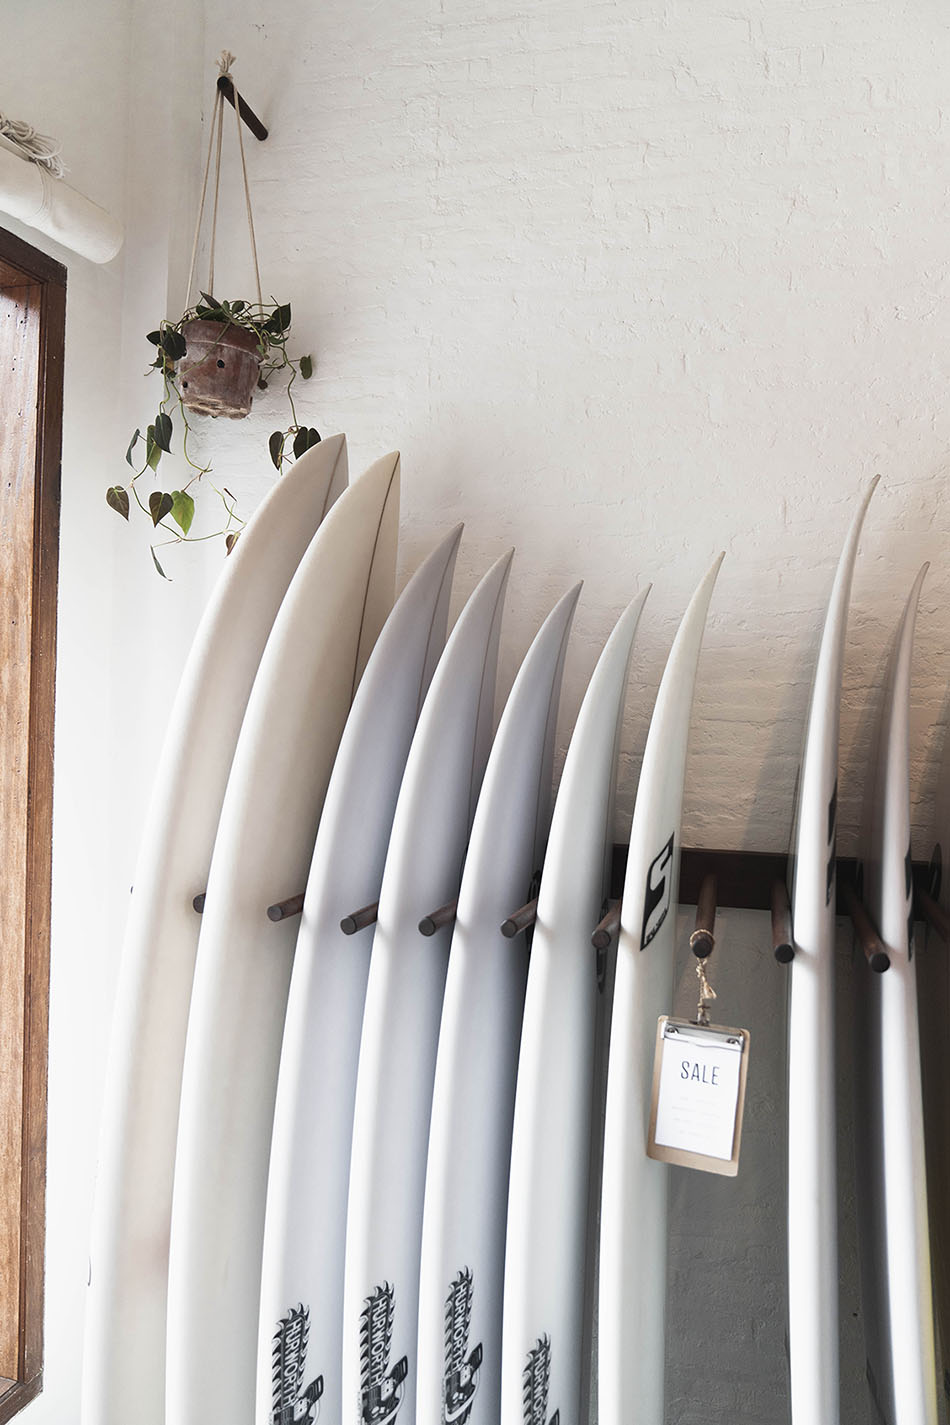 Nalua Surf shop - Kuta Lombok